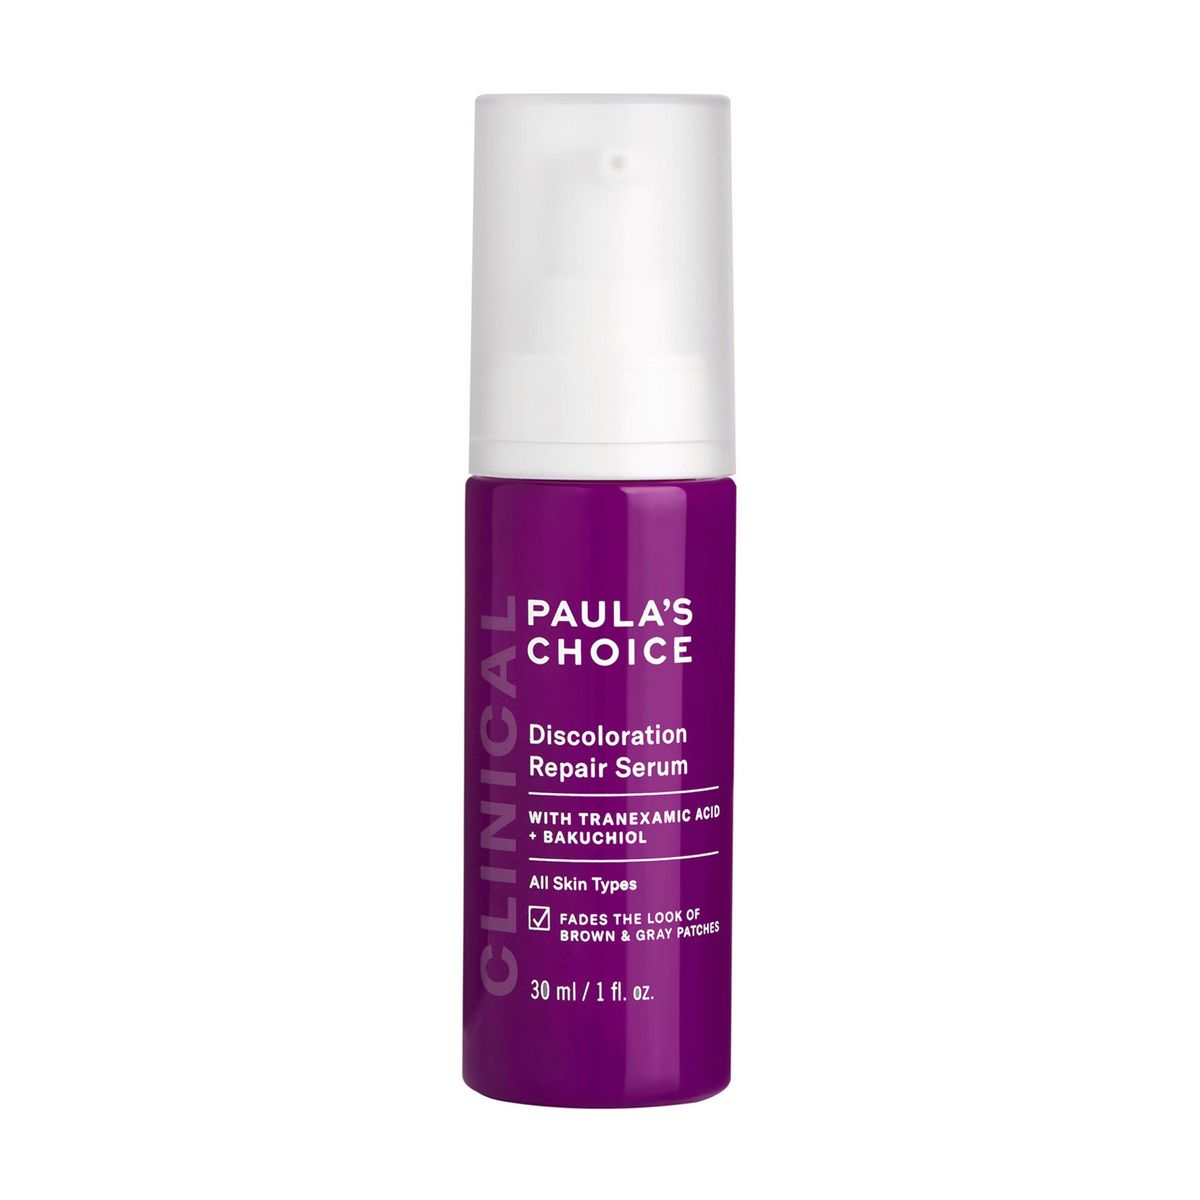 paulas choice discoloration repair serum